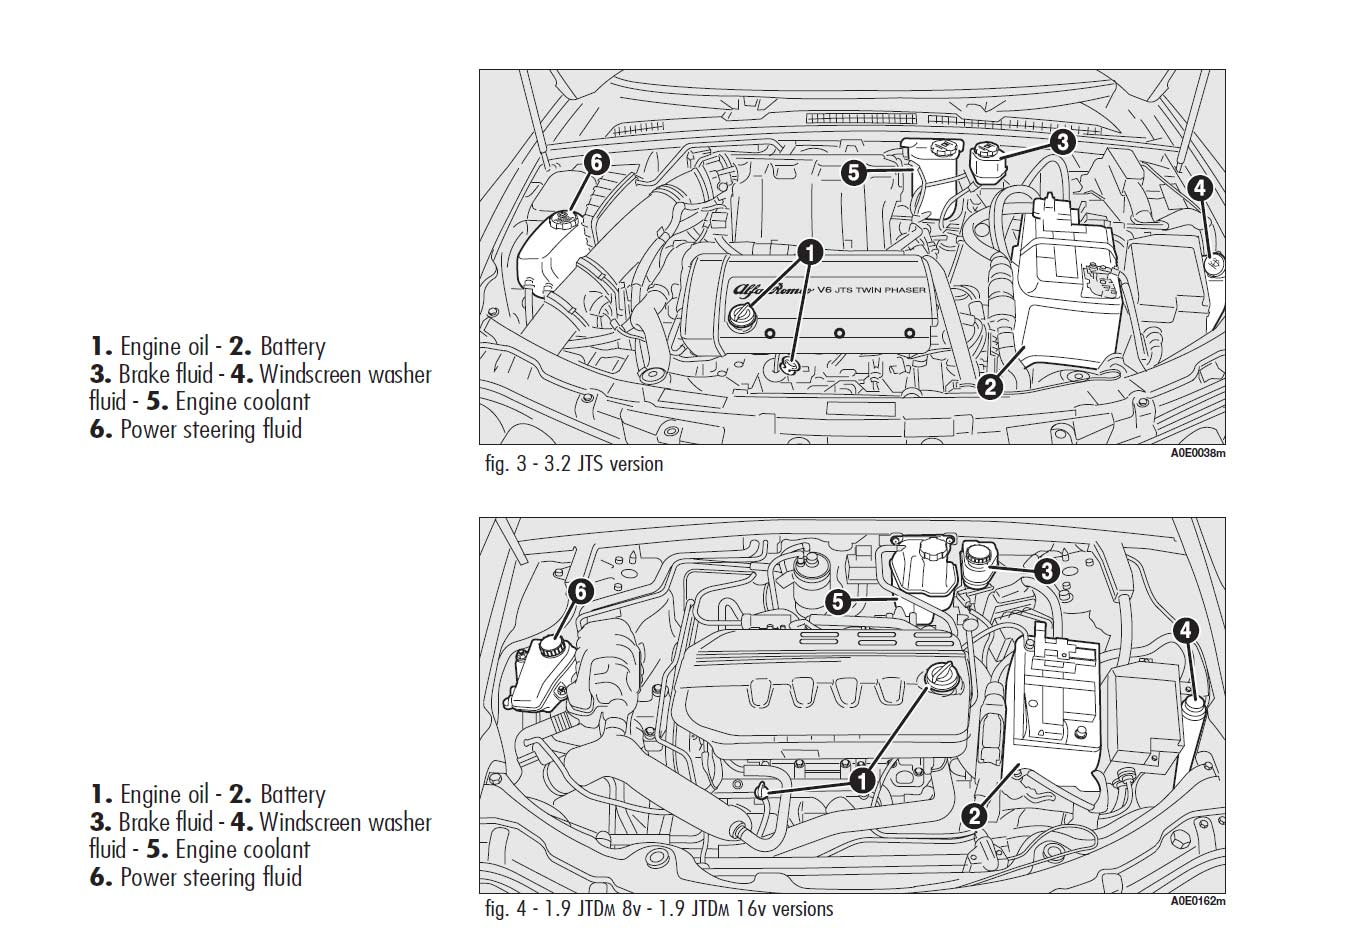 hight resolution of fiat doblo jtd wiring diagram fiat 500 pop diagram wiring fiat grande punto wiring diagrams fiat